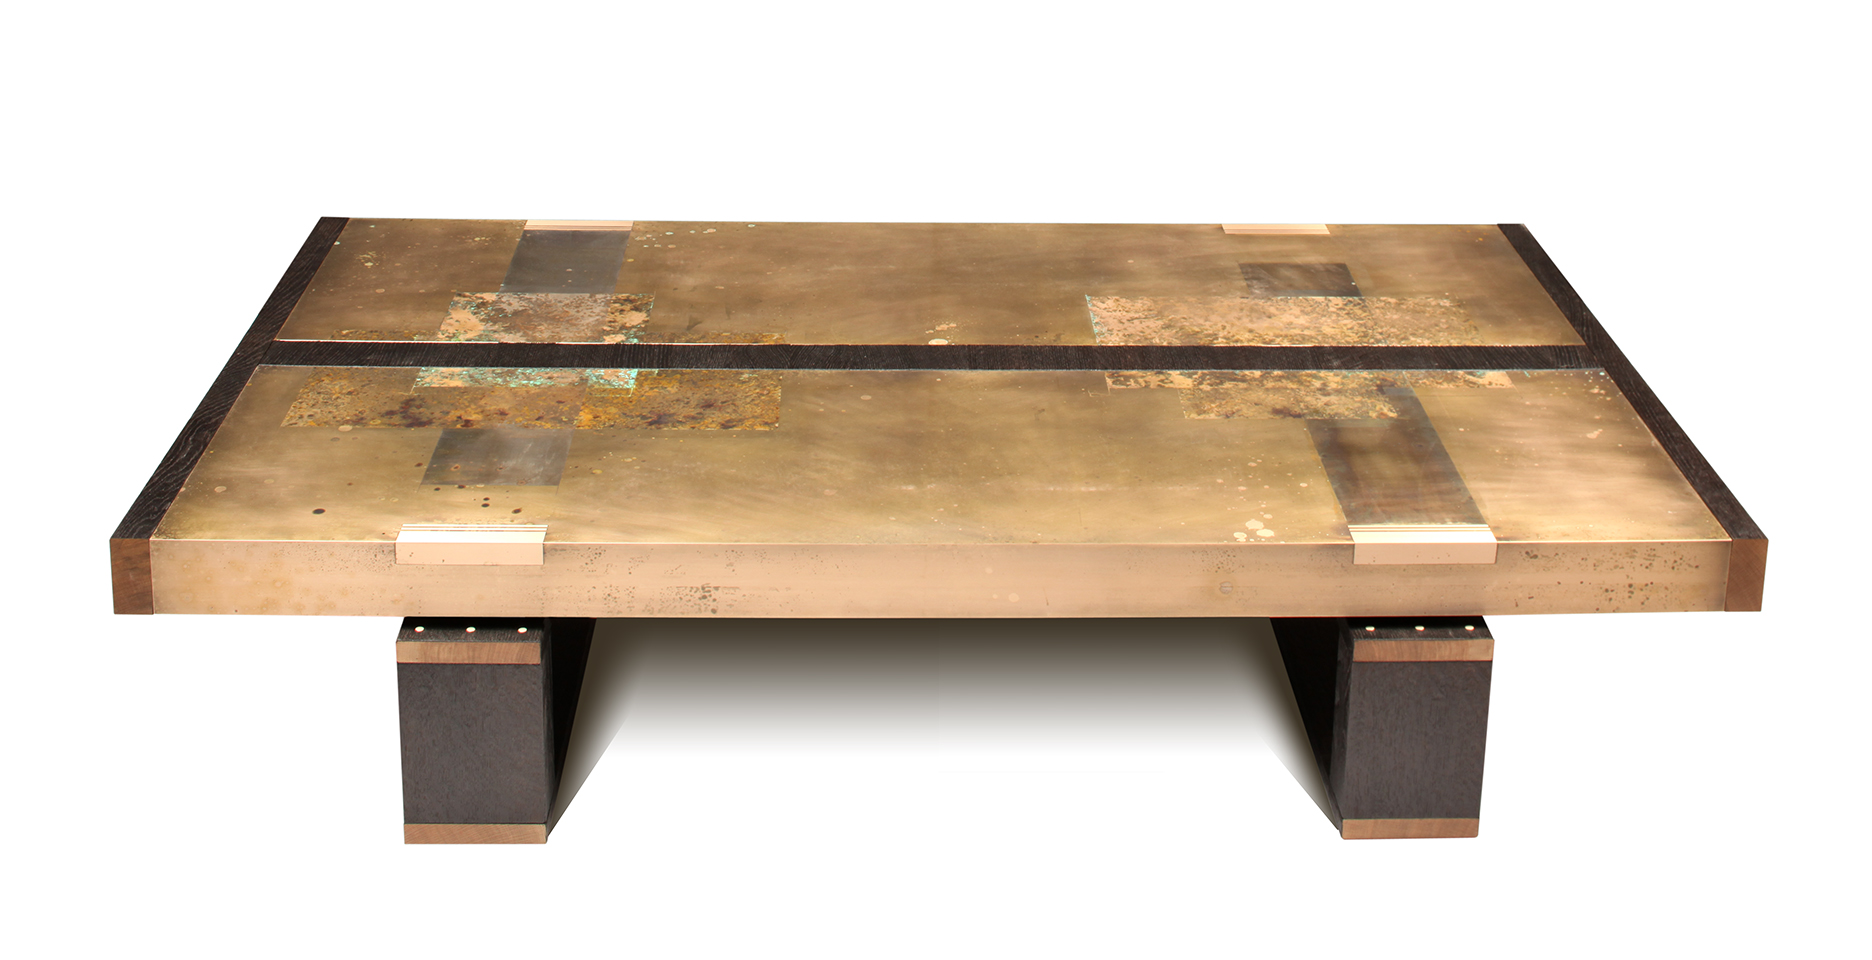 Artistic bronze coffee table